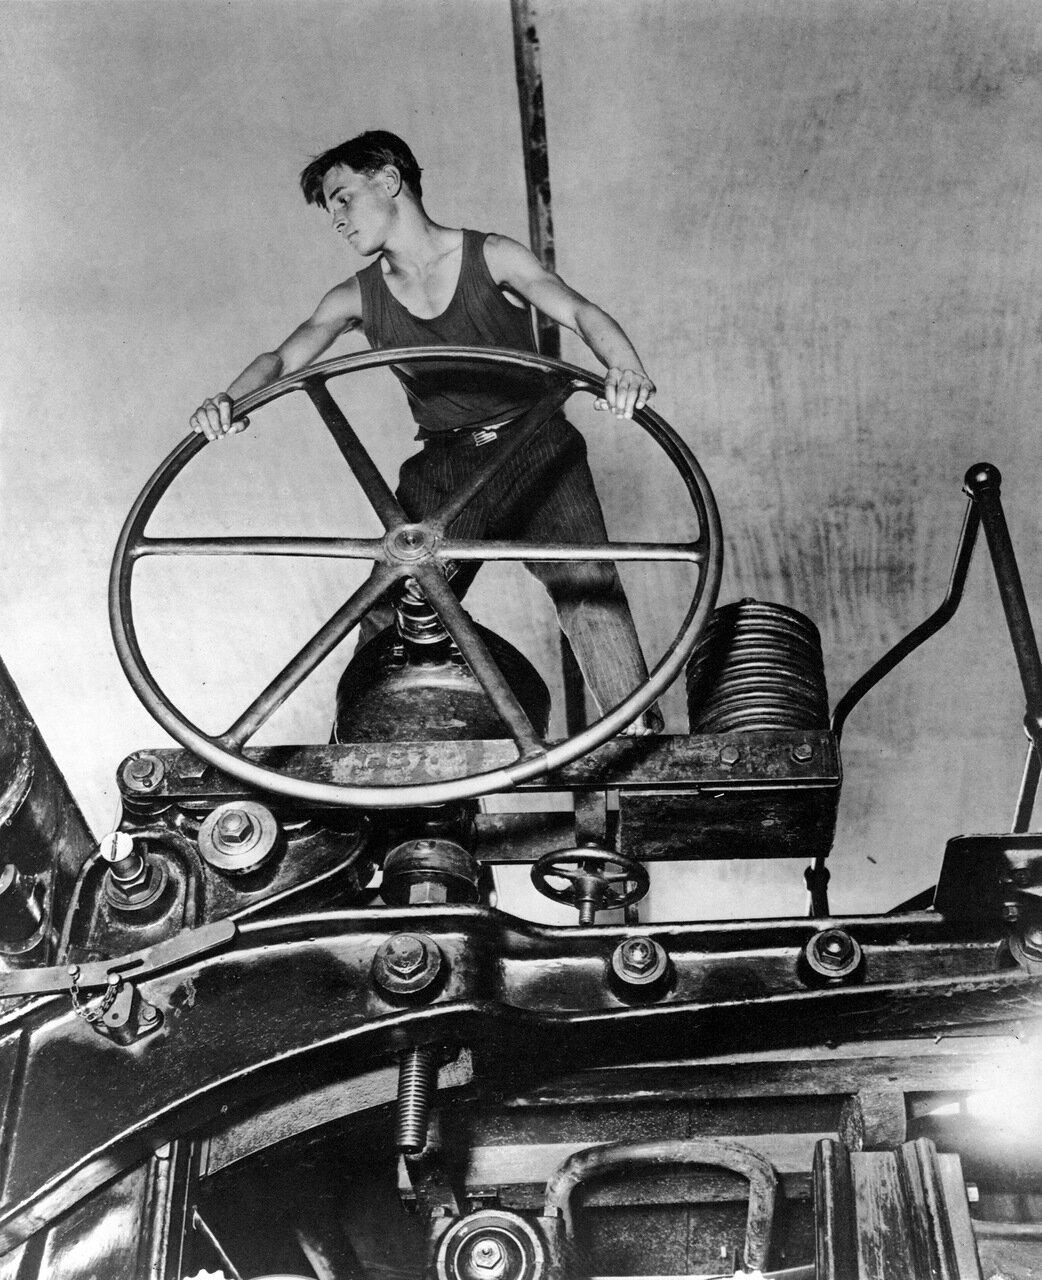 Комсомолец за штурвалом. Целлюлозно-бумажный комбинат. Балахна. 1931 год.